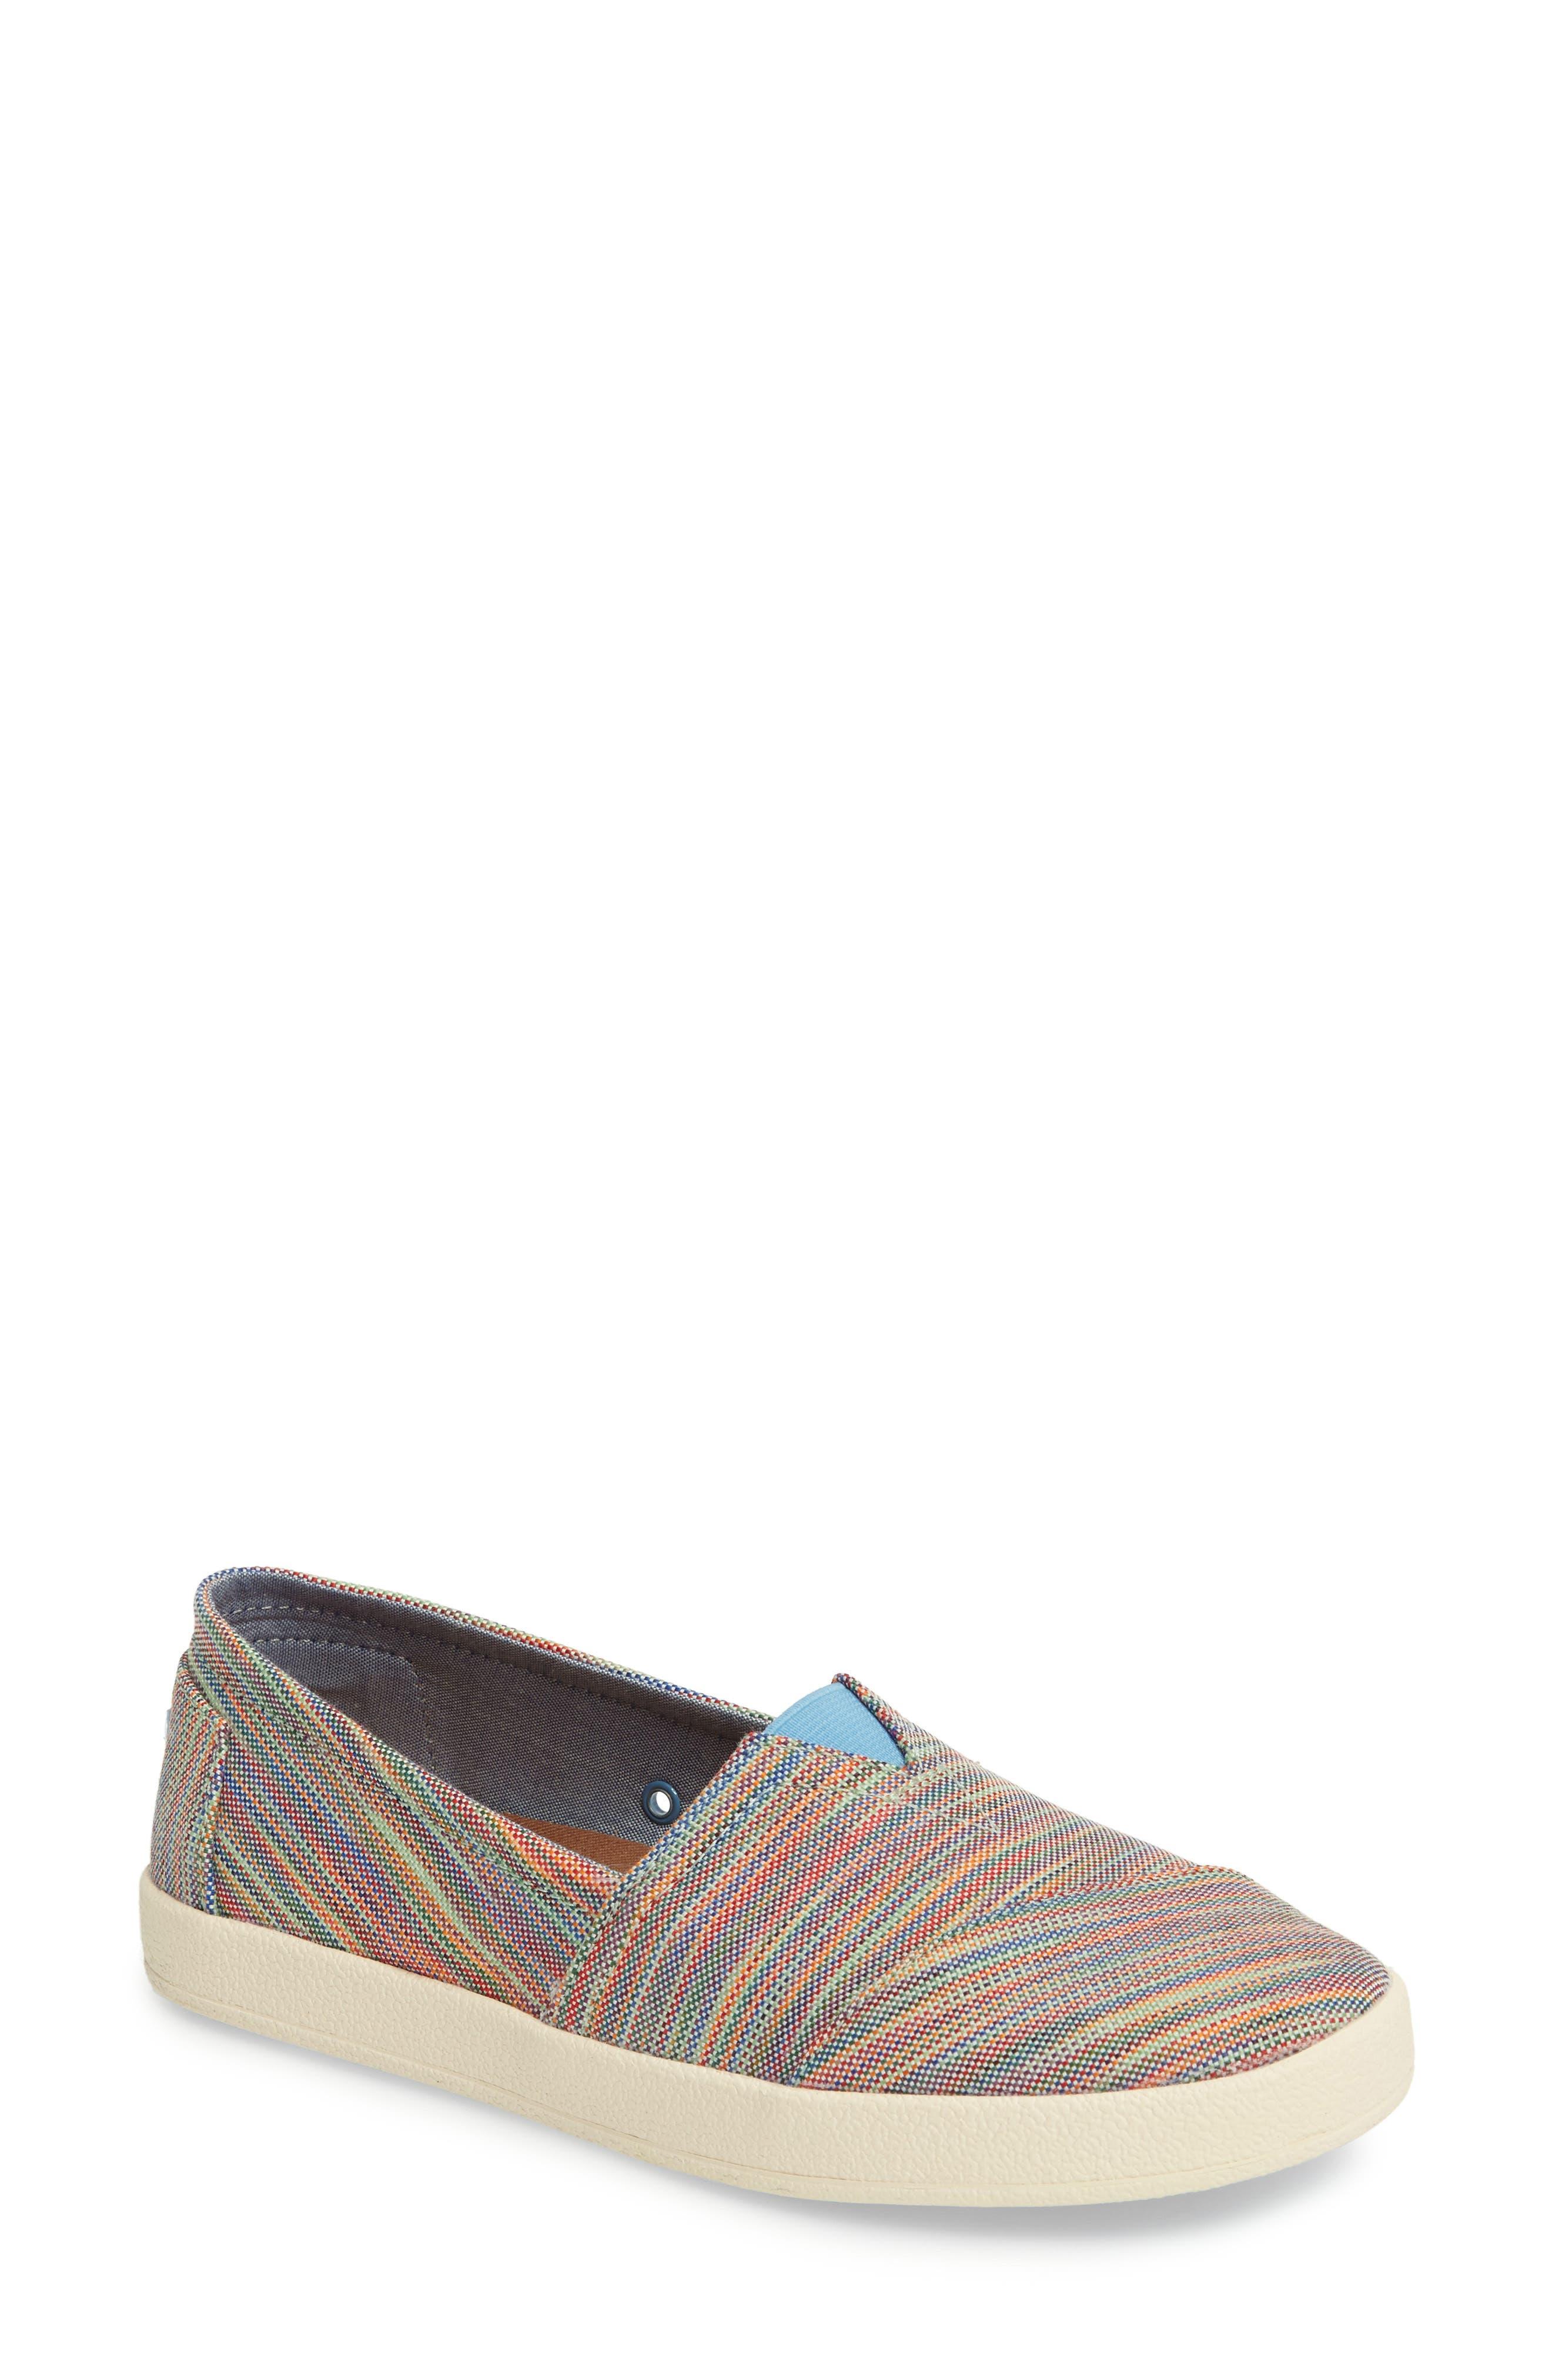 TOMS Avalon Slip-On, Main, color, 965